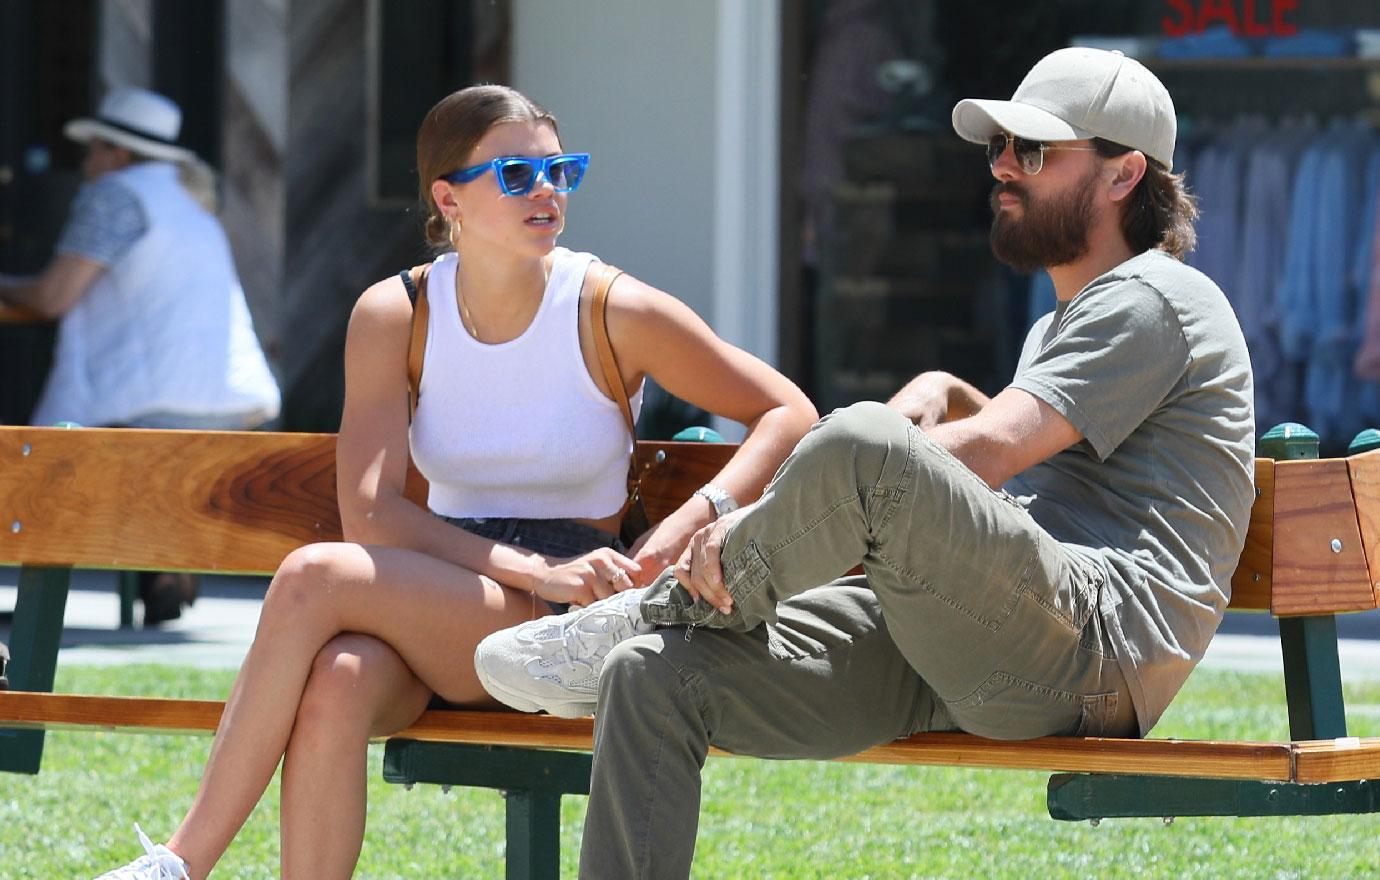 Scott Disick Sofia Richie Hang Out In Malibu